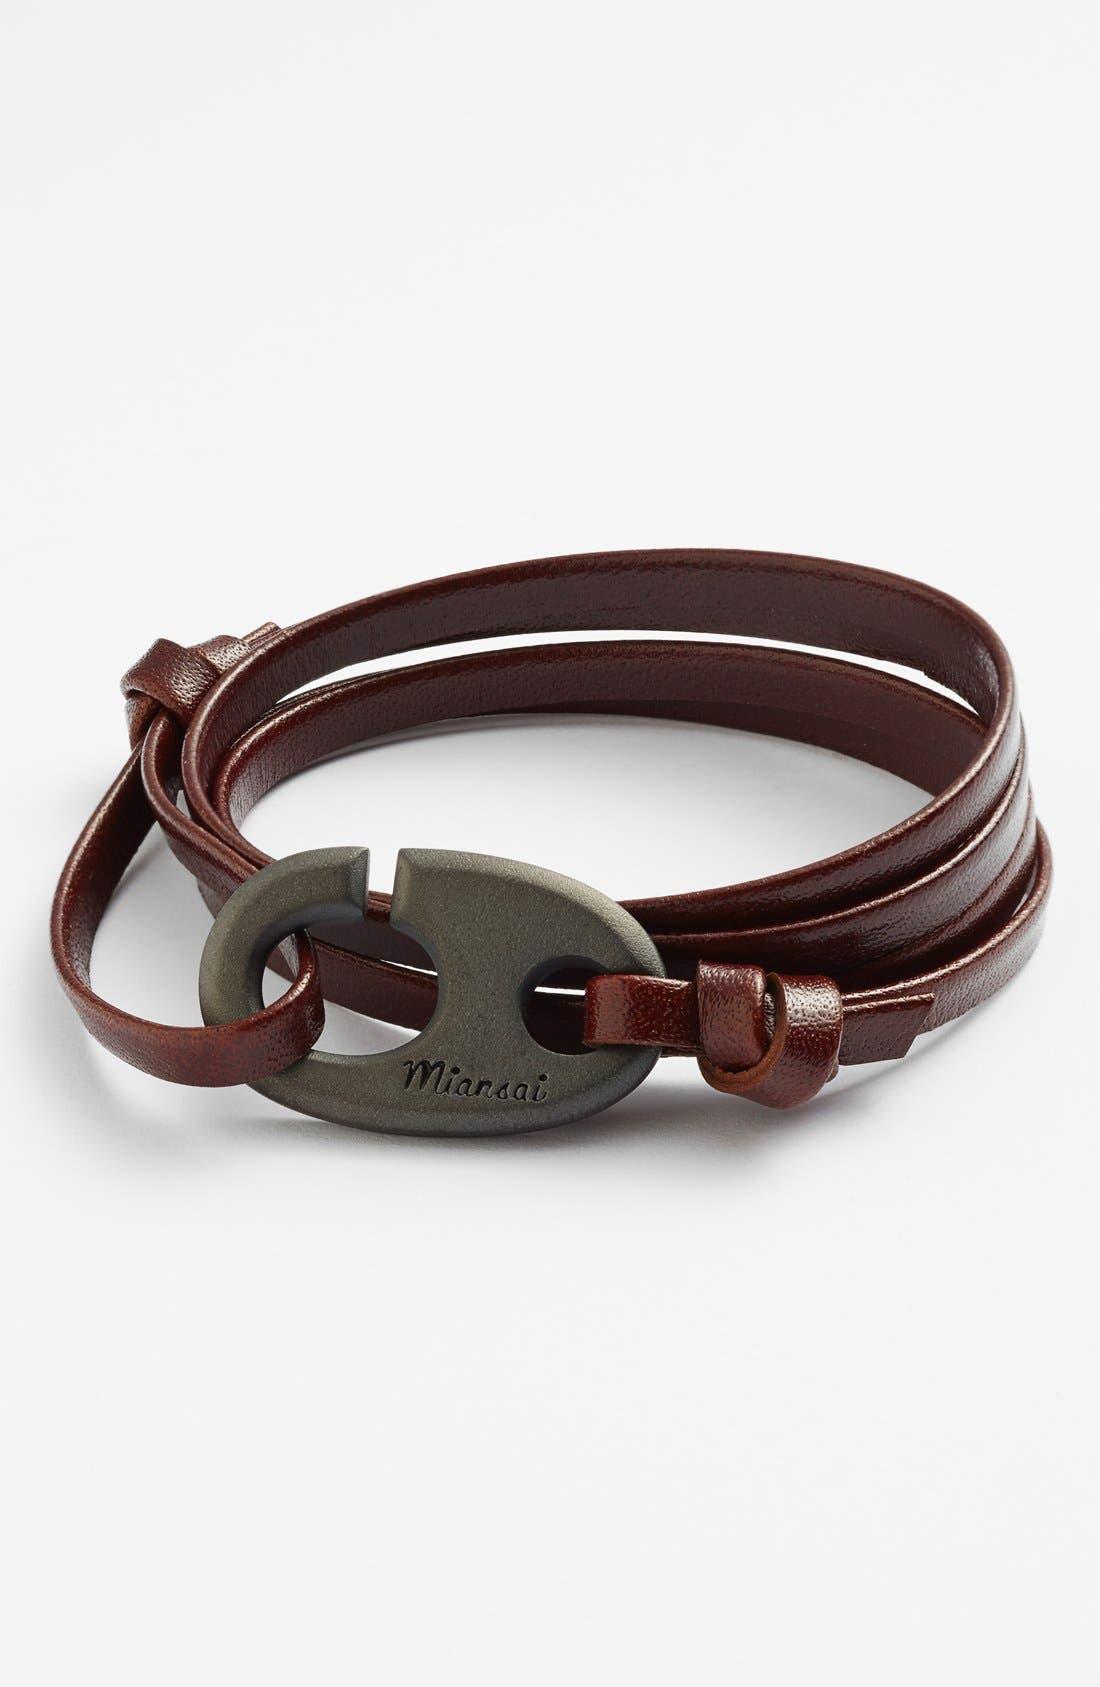 Alternate Image 1 Selected - Miansai Brummel Hook Leather Bracelet